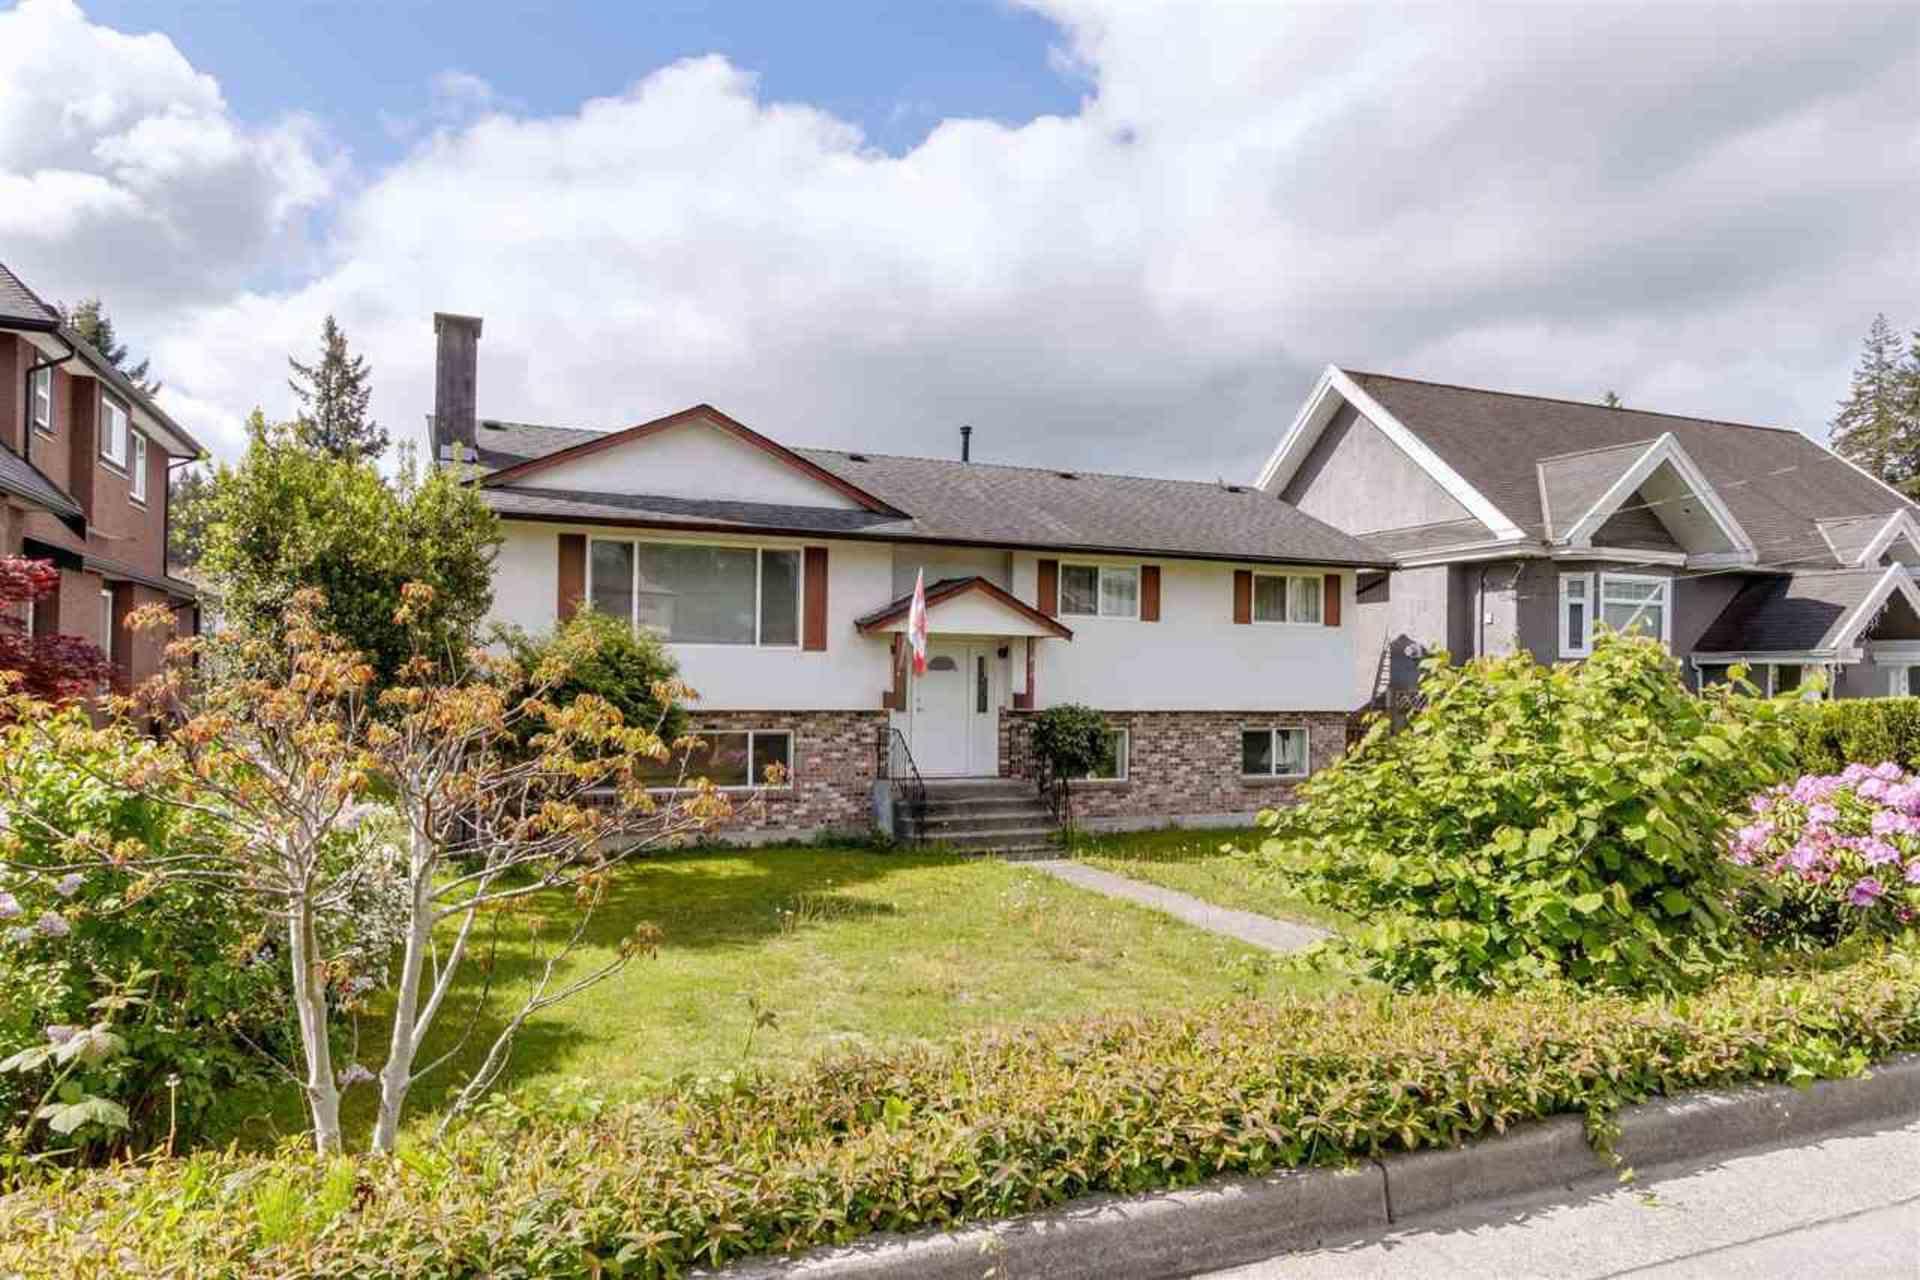 810-smith-avenue-coquitlam-west-coquitlam-02 of 810 Smith Avenue, Coquitlam West, Coquitlam